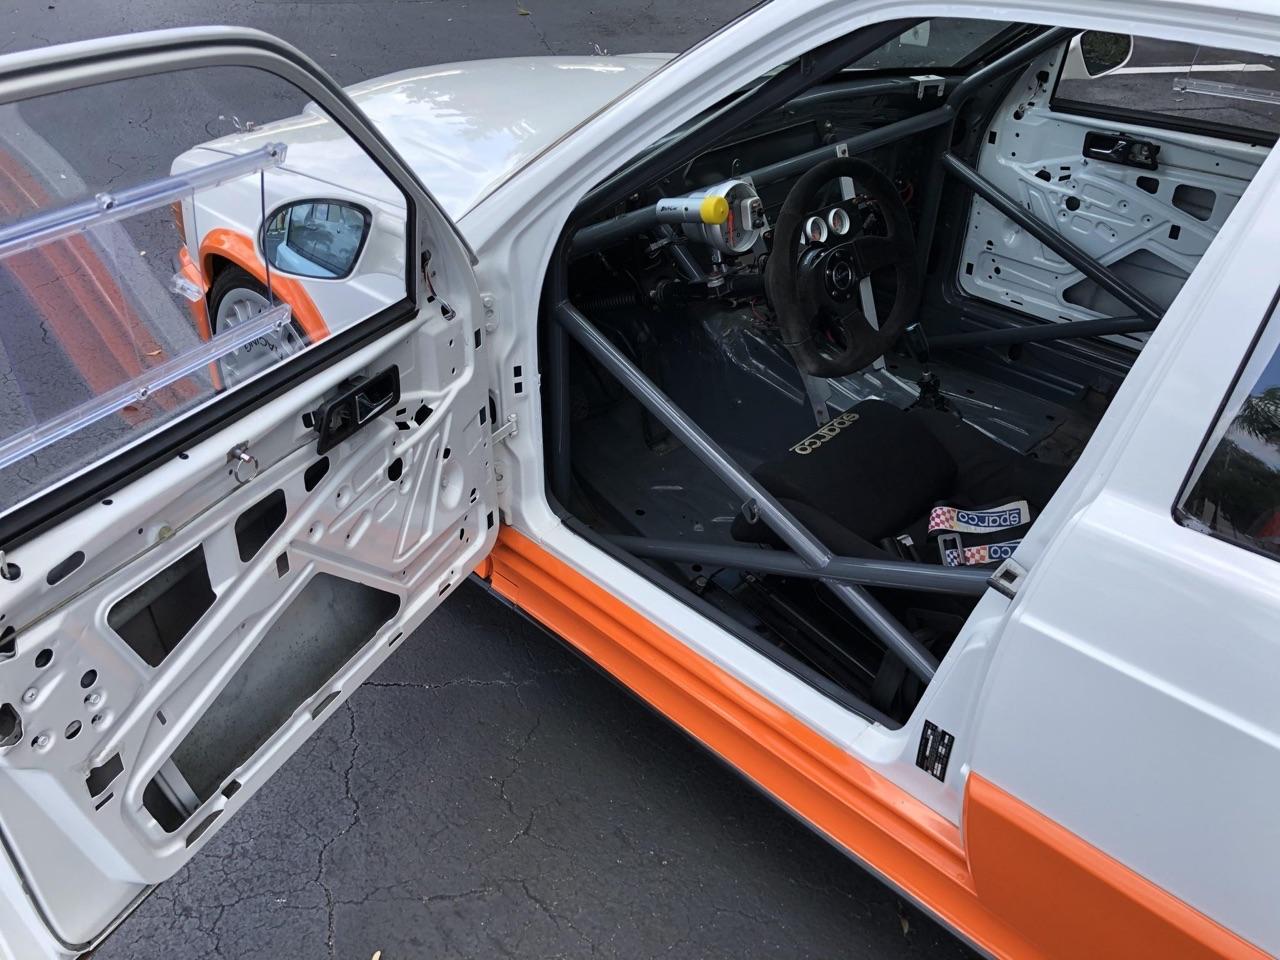 Mercedes 190 3.2 l - Track mode... 6